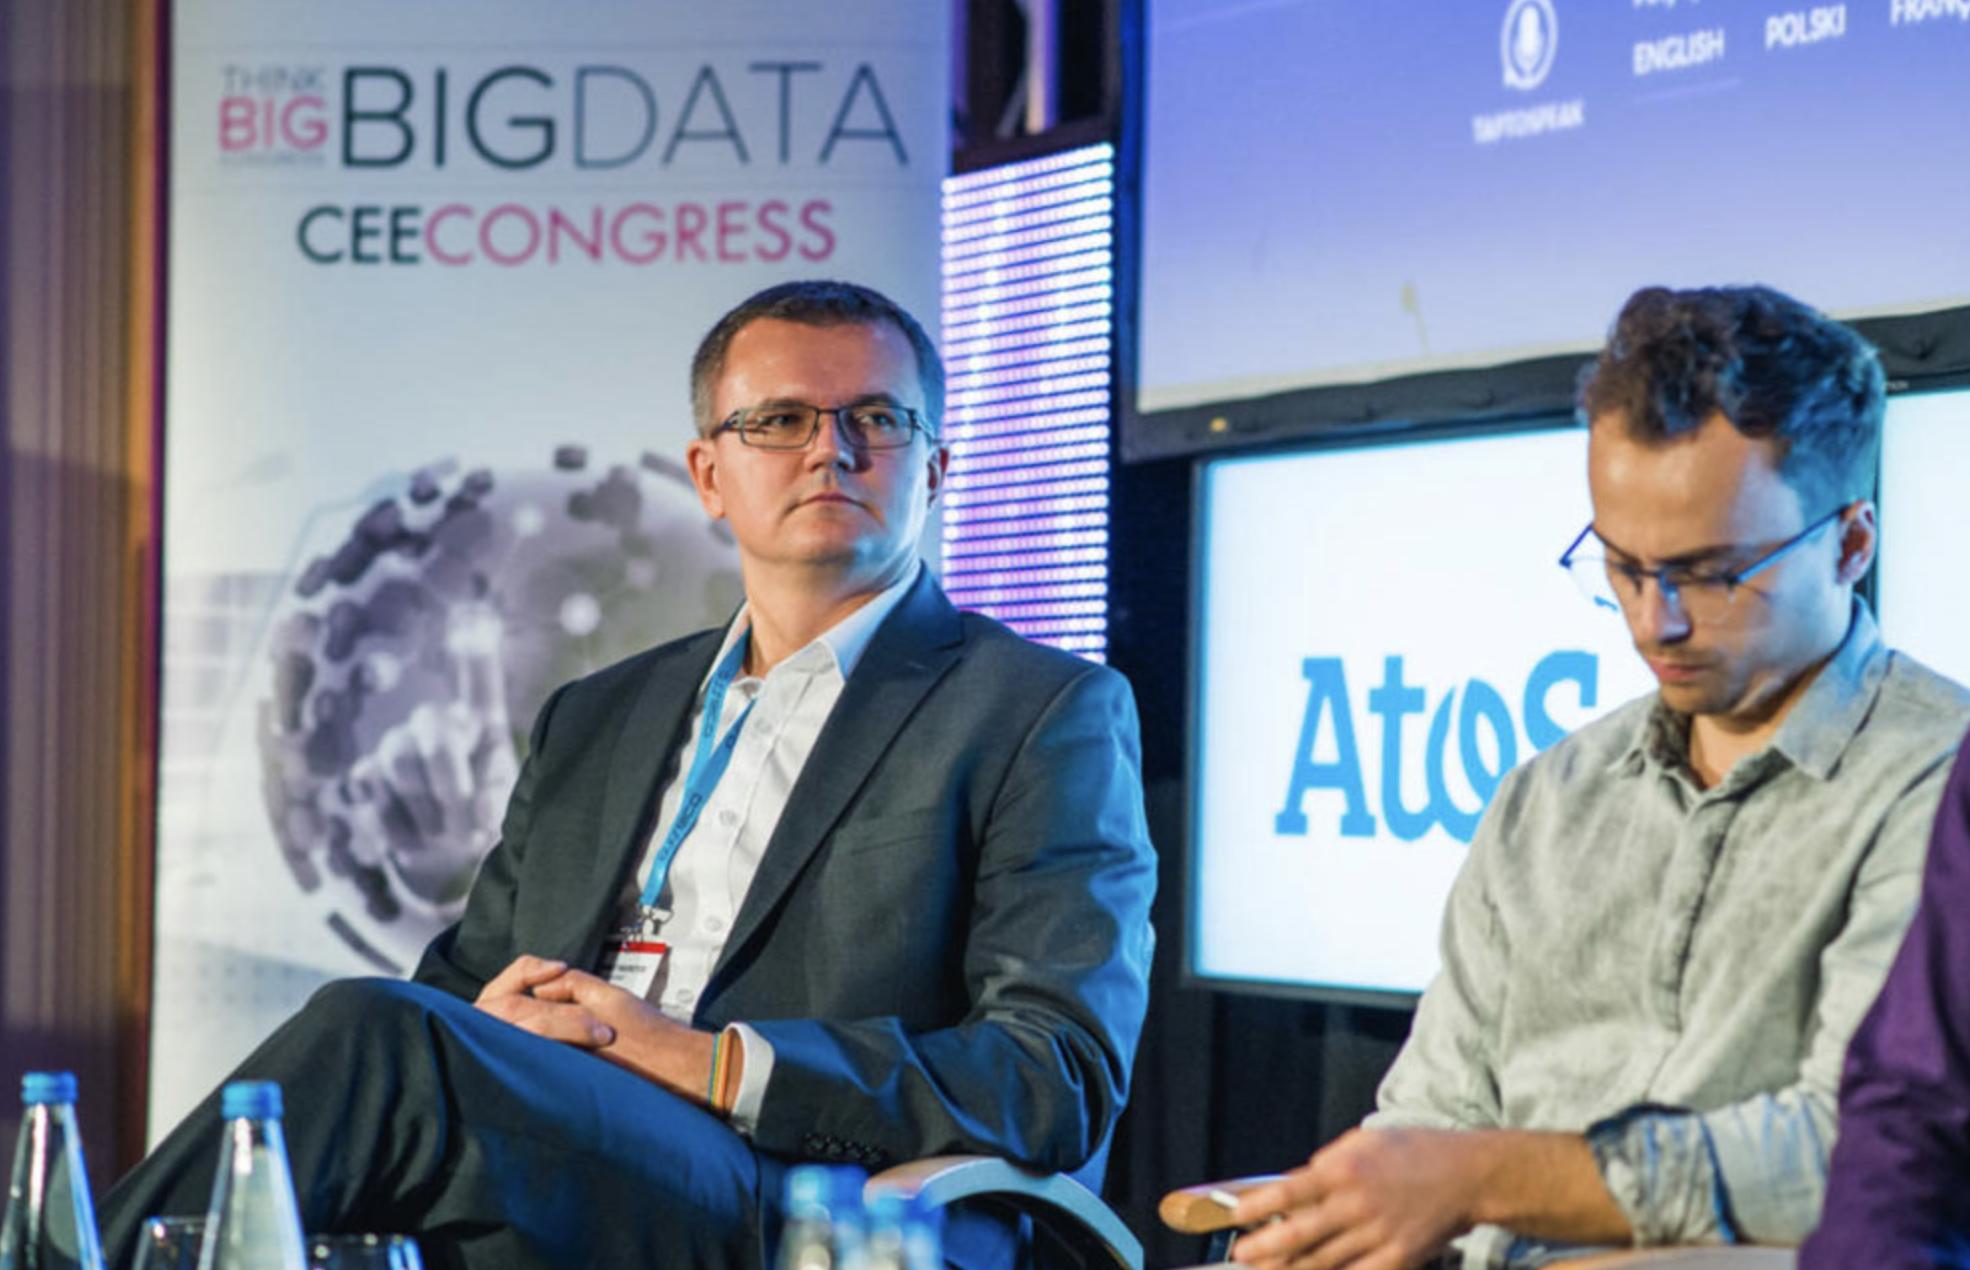 BigData AI conference Norbert Biedrzycki 3